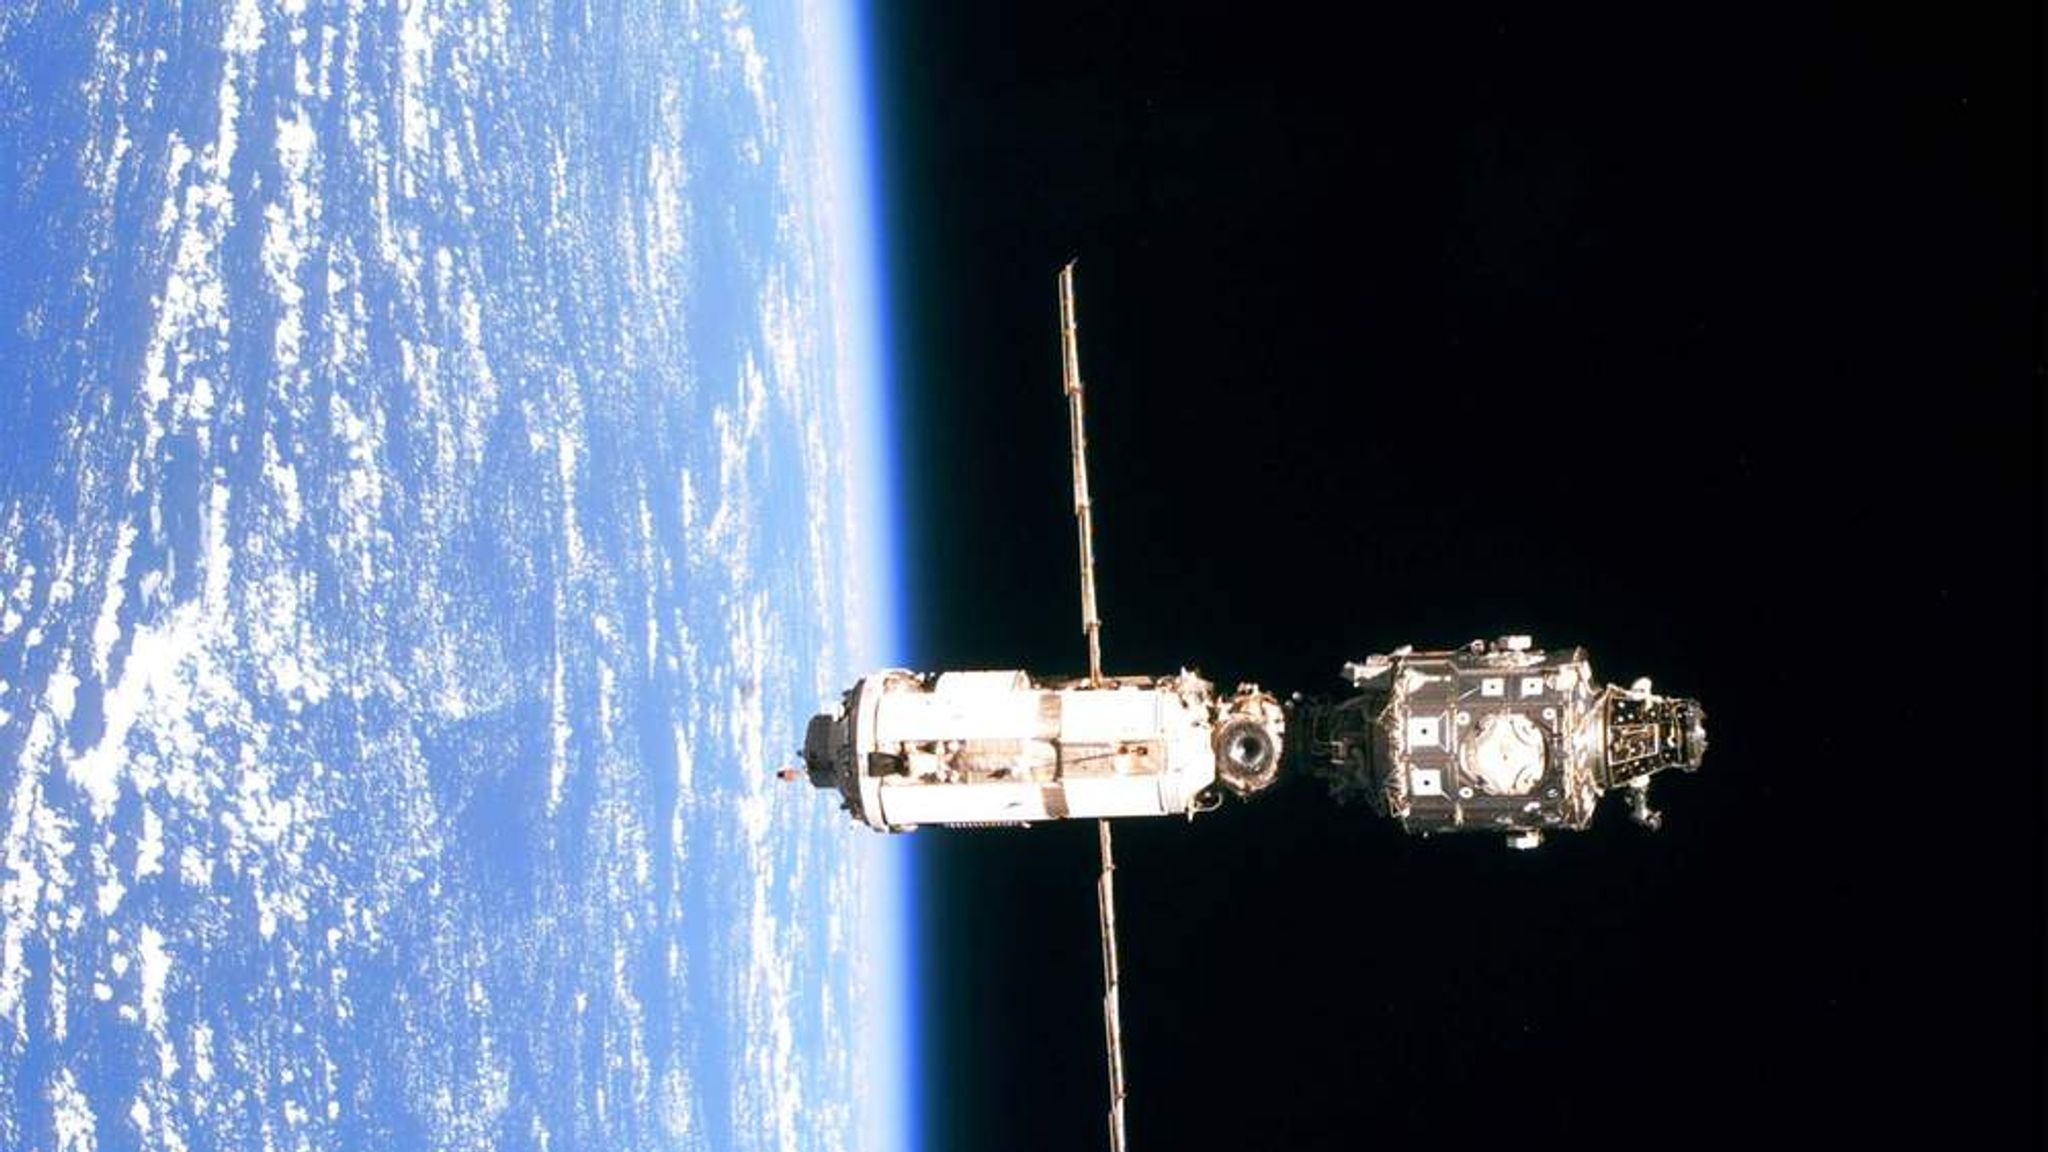 space station leak - HD2048×1152